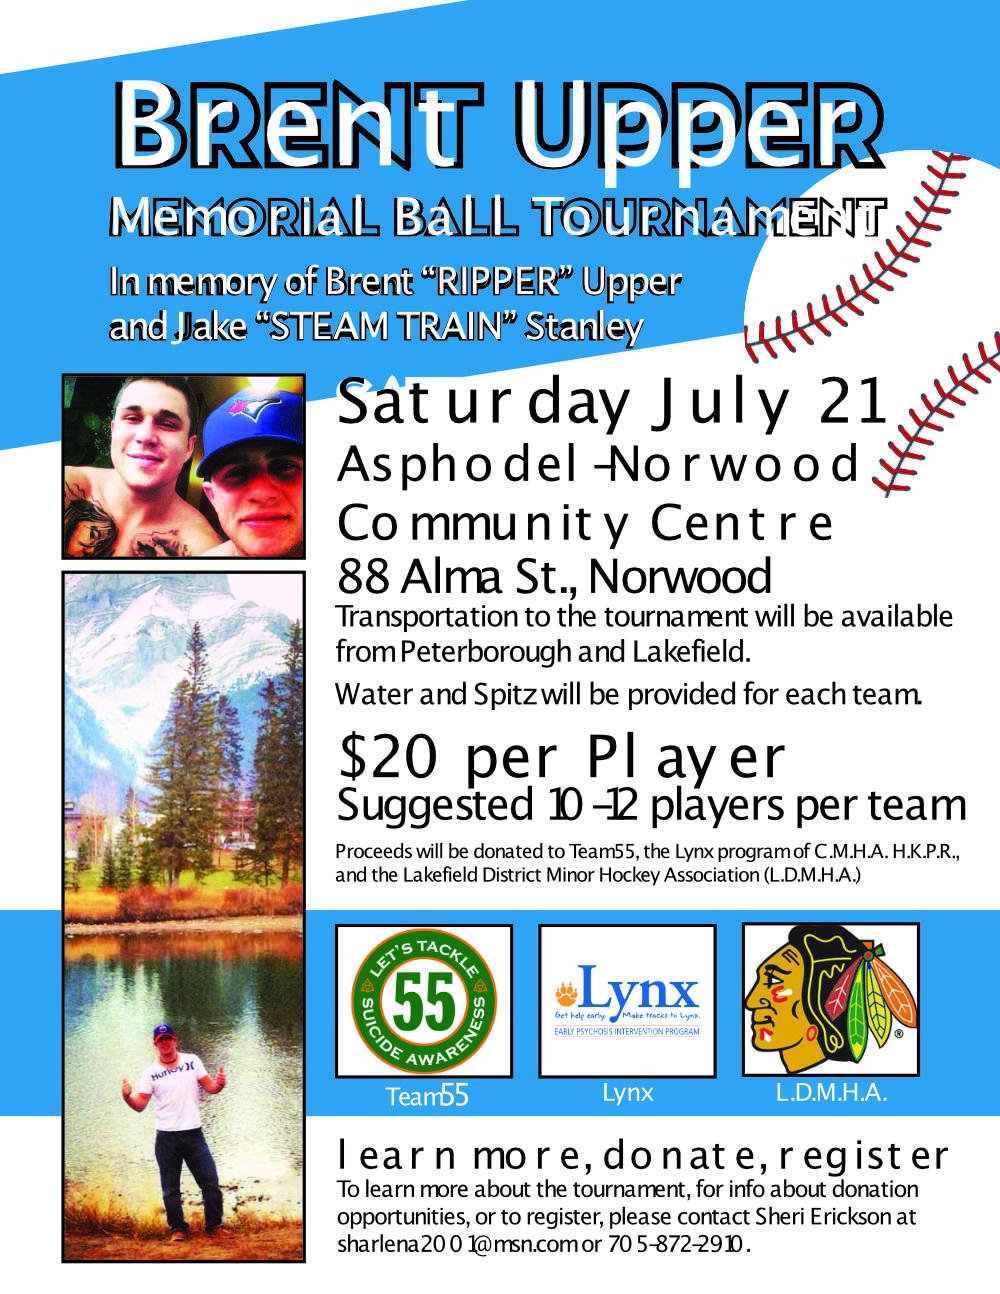 Brent-Upper-Memorial-Ball-Tournament-Poster.jpg